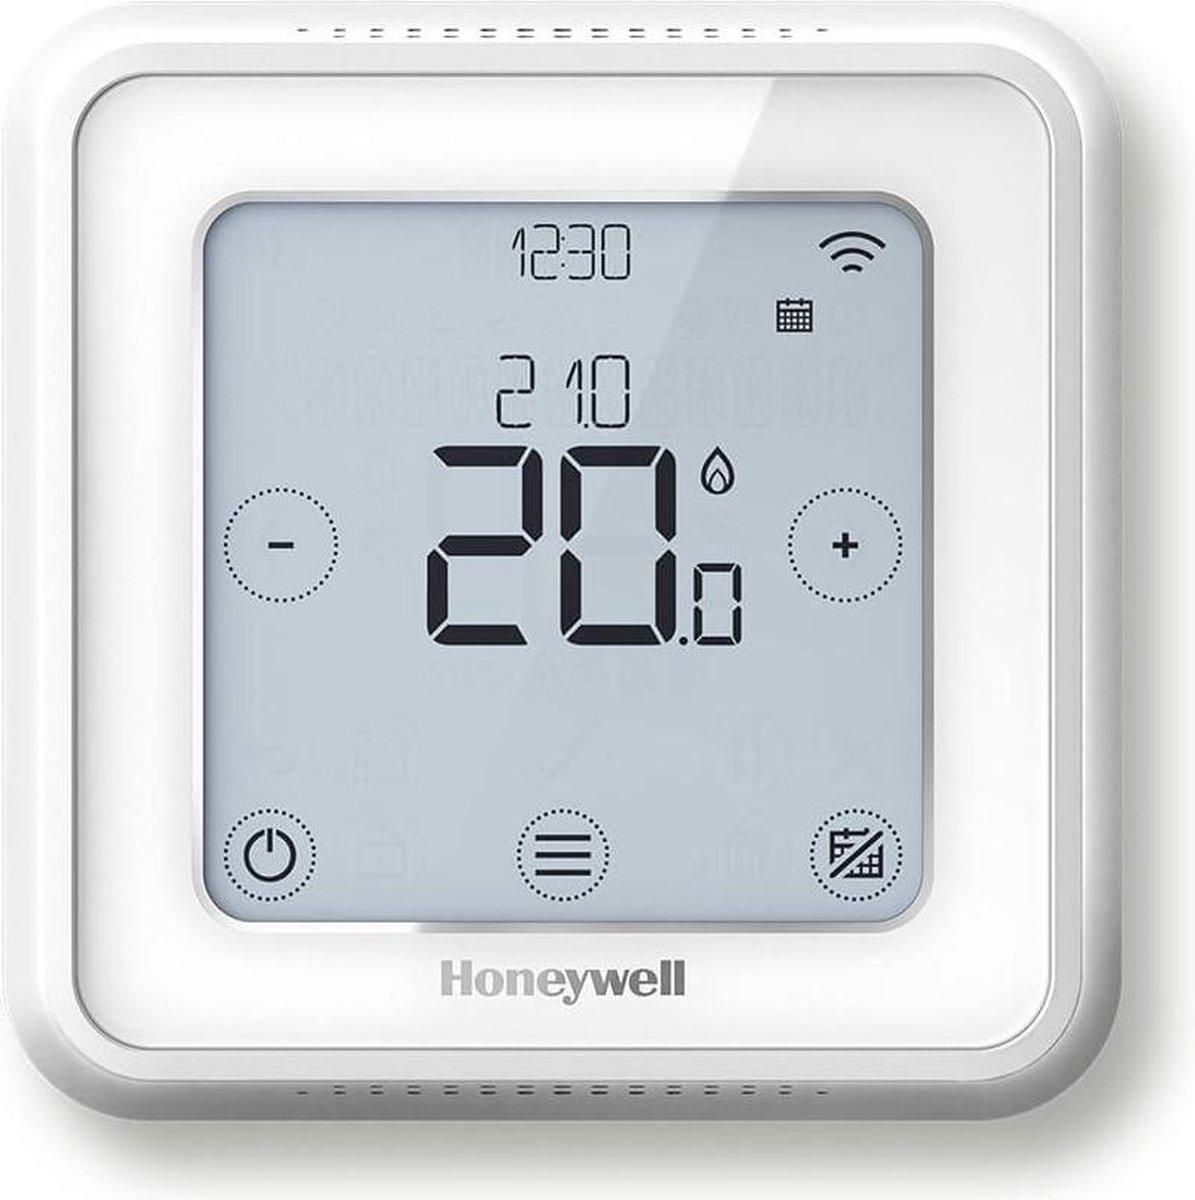 Honeywell Lyric T6 Slimme Thermostaat Wit - Bedraad